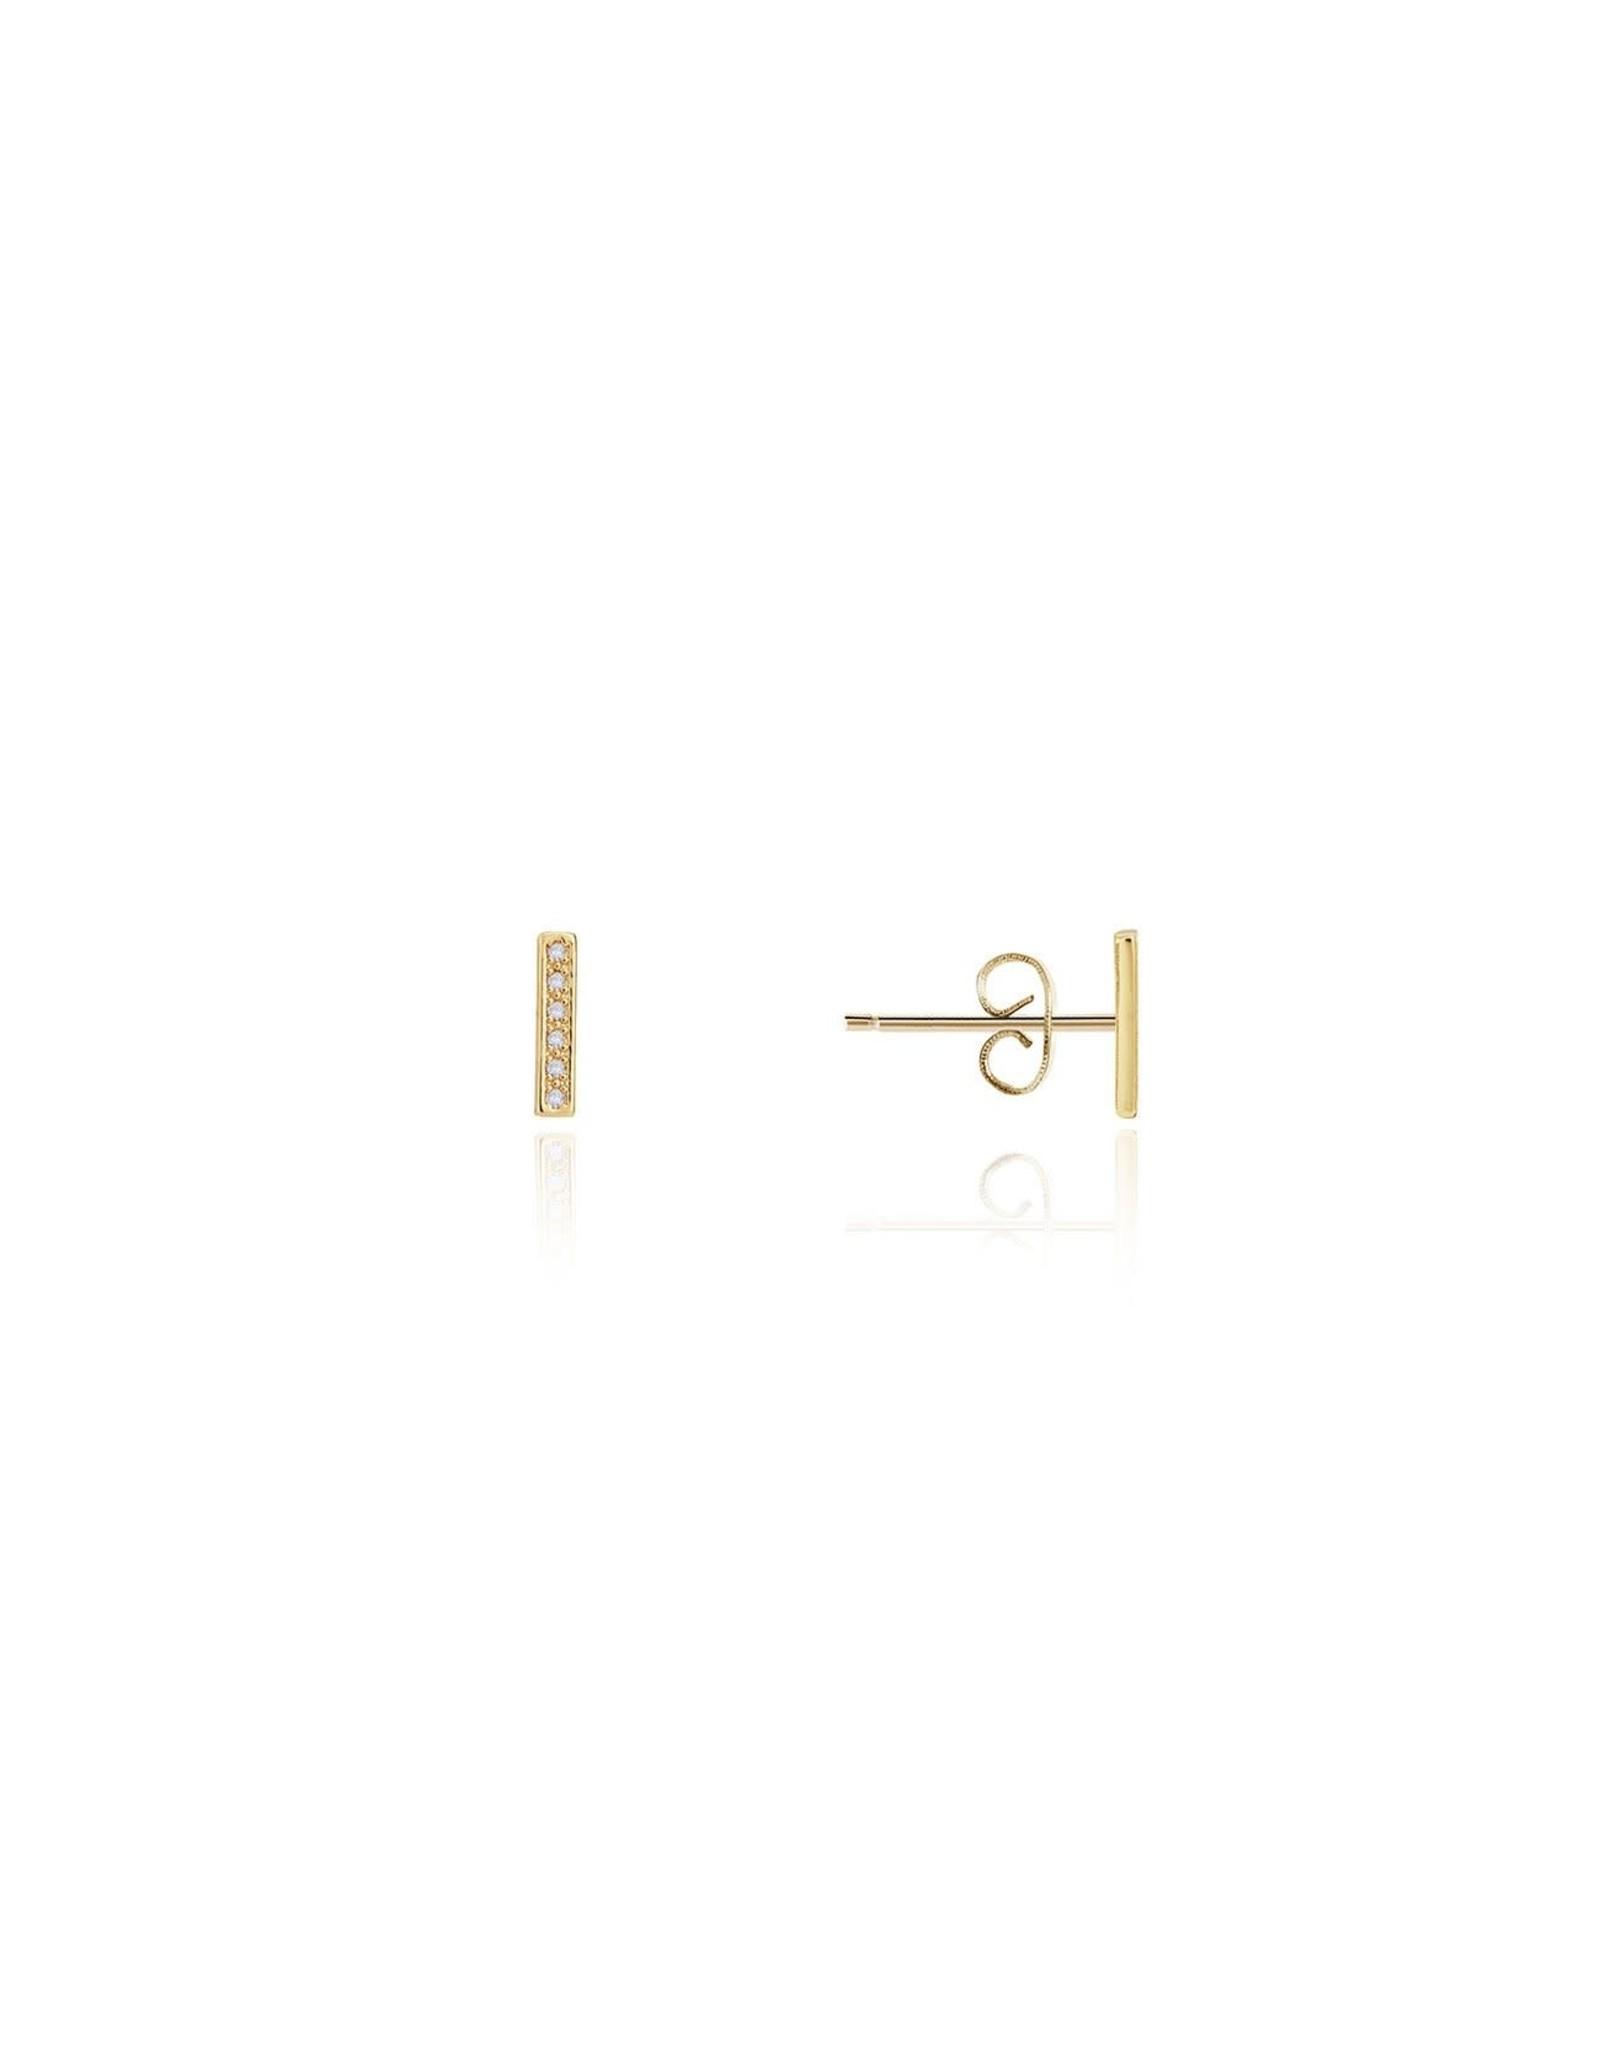 Joma Jewellery Treasure the Little Things Oorbellen - Good as Gold